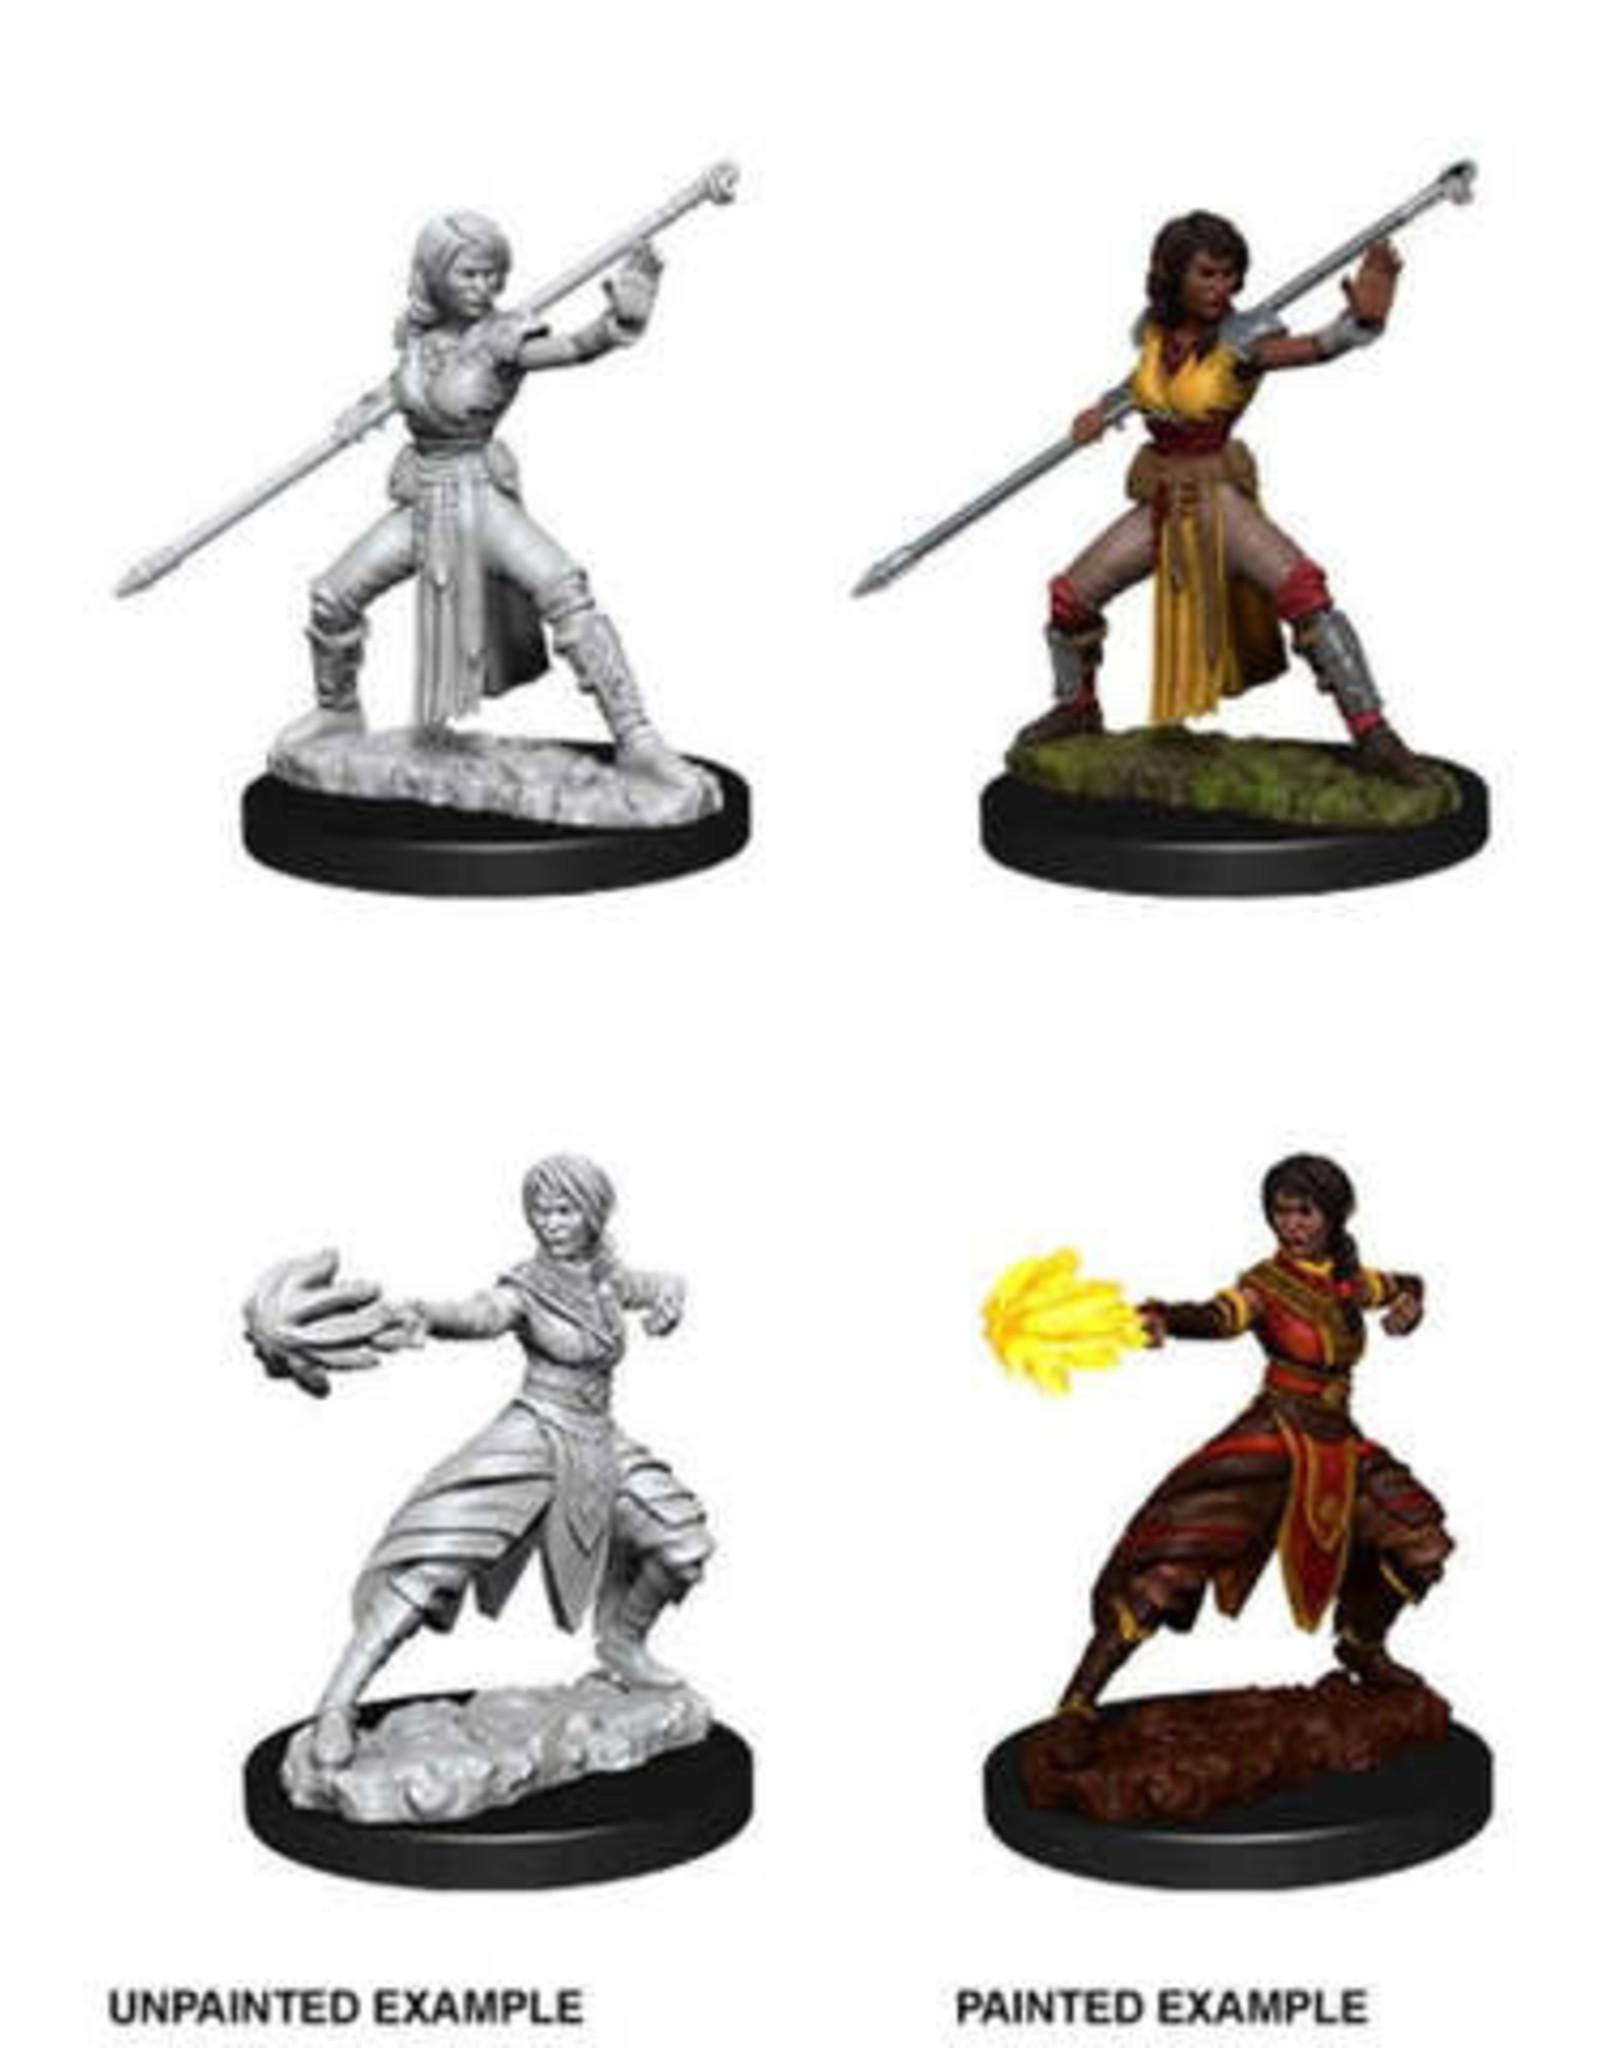 WizKids Dungeons & Dragons Nolzur's Marvelous Miniatures: Female Half Elf Monk